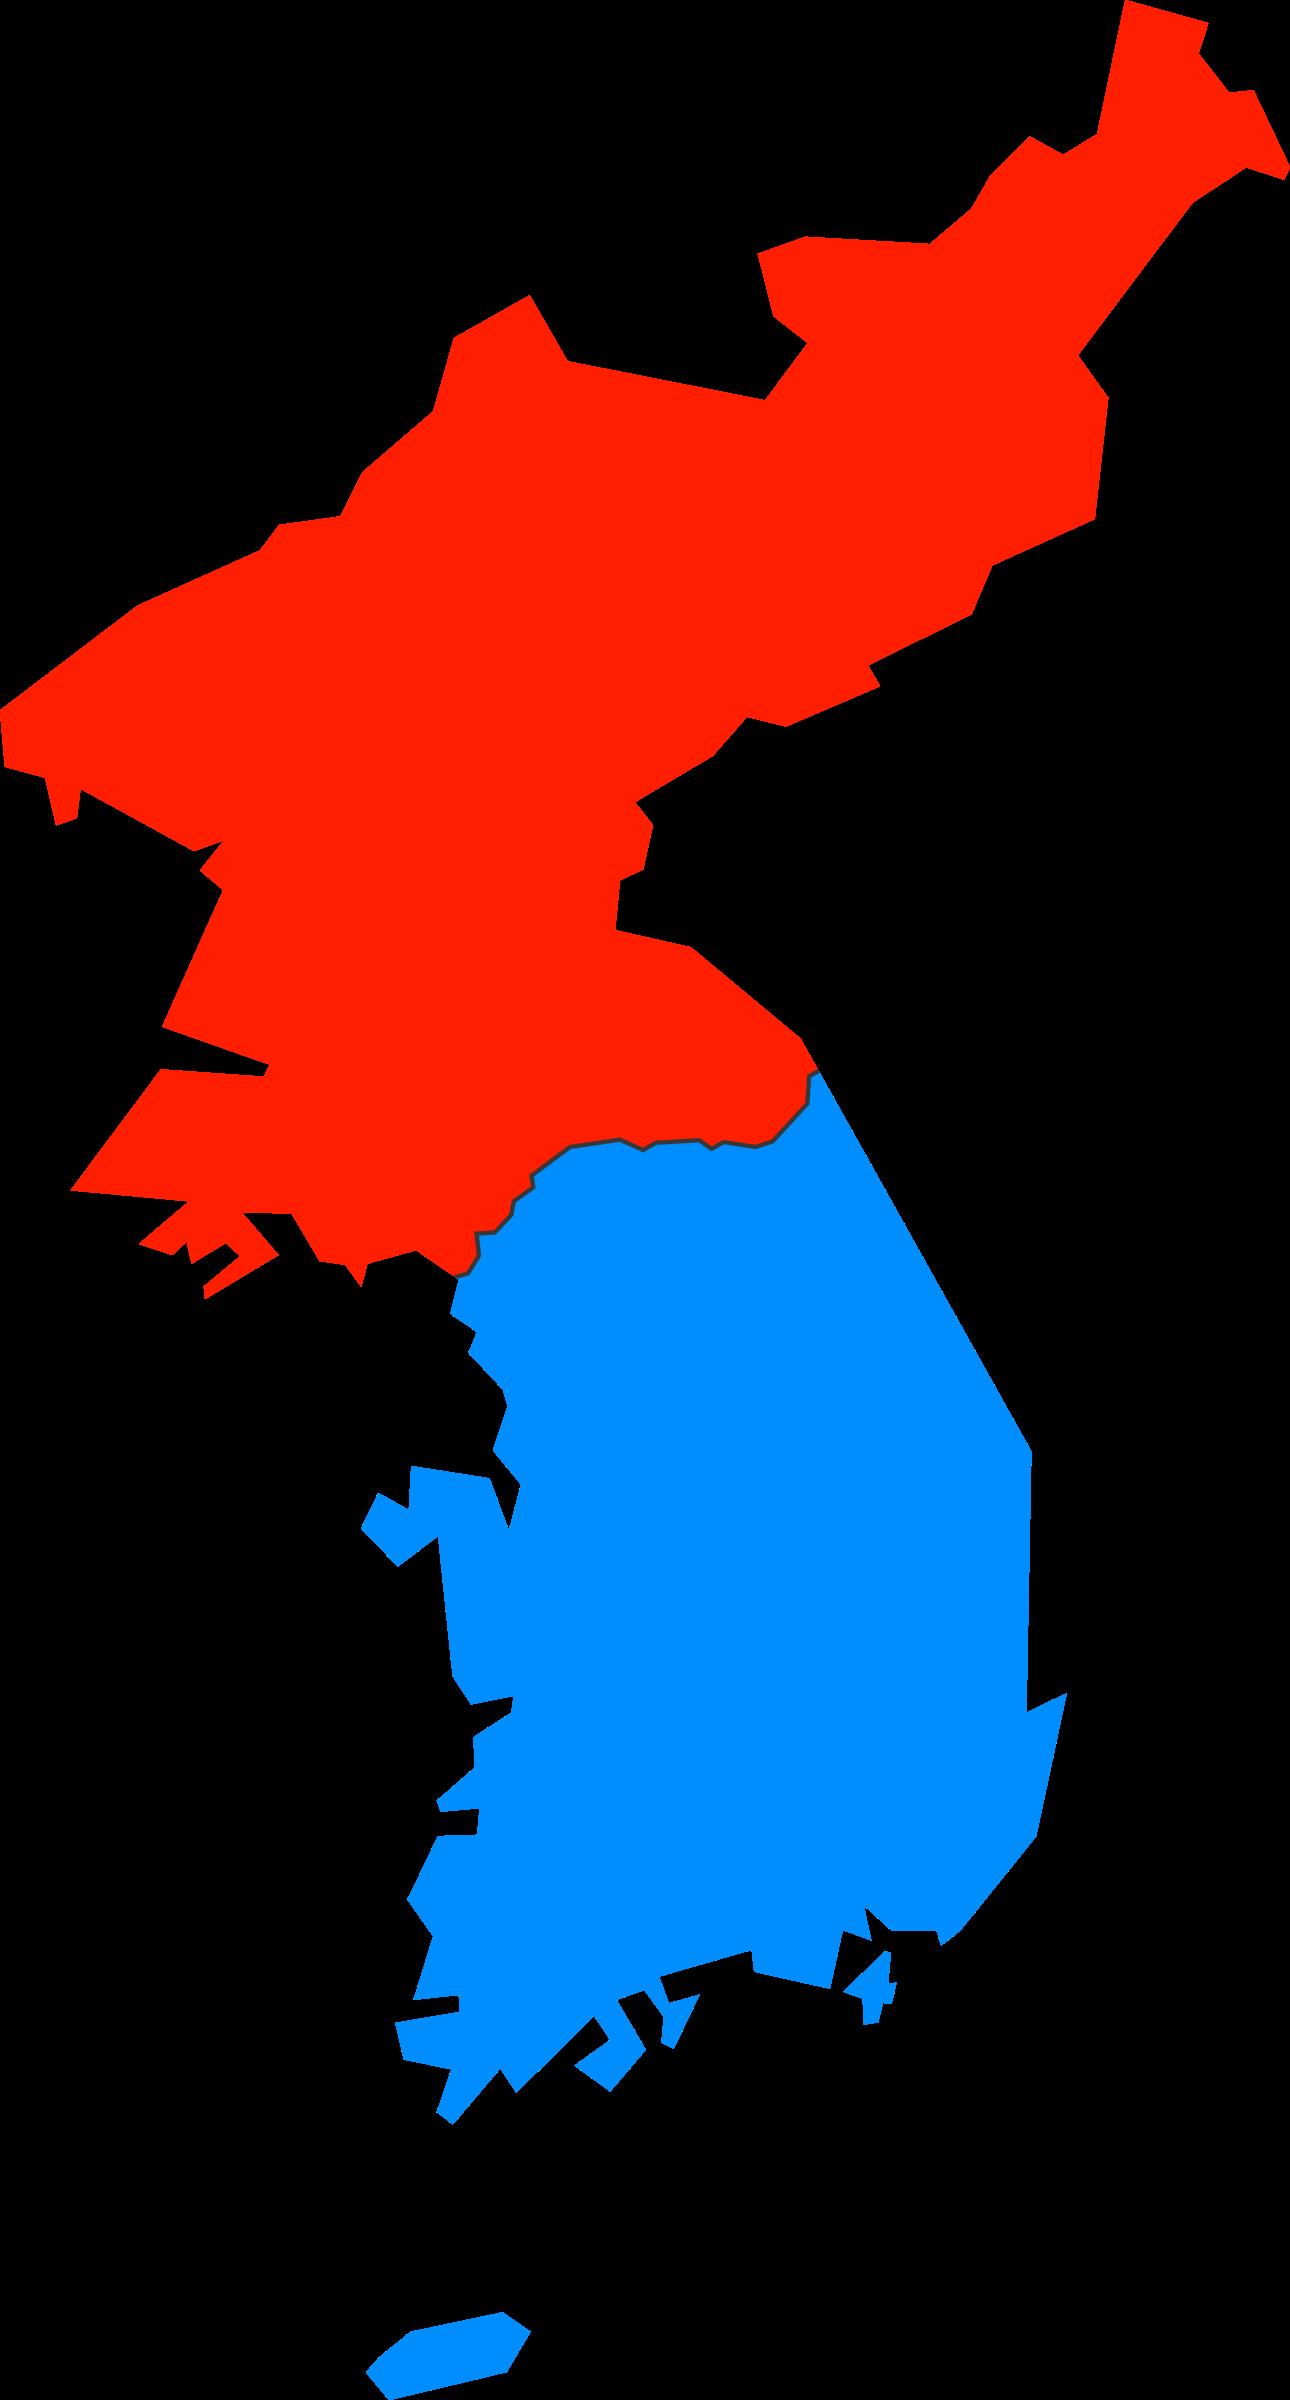 Korea PNG - 101334